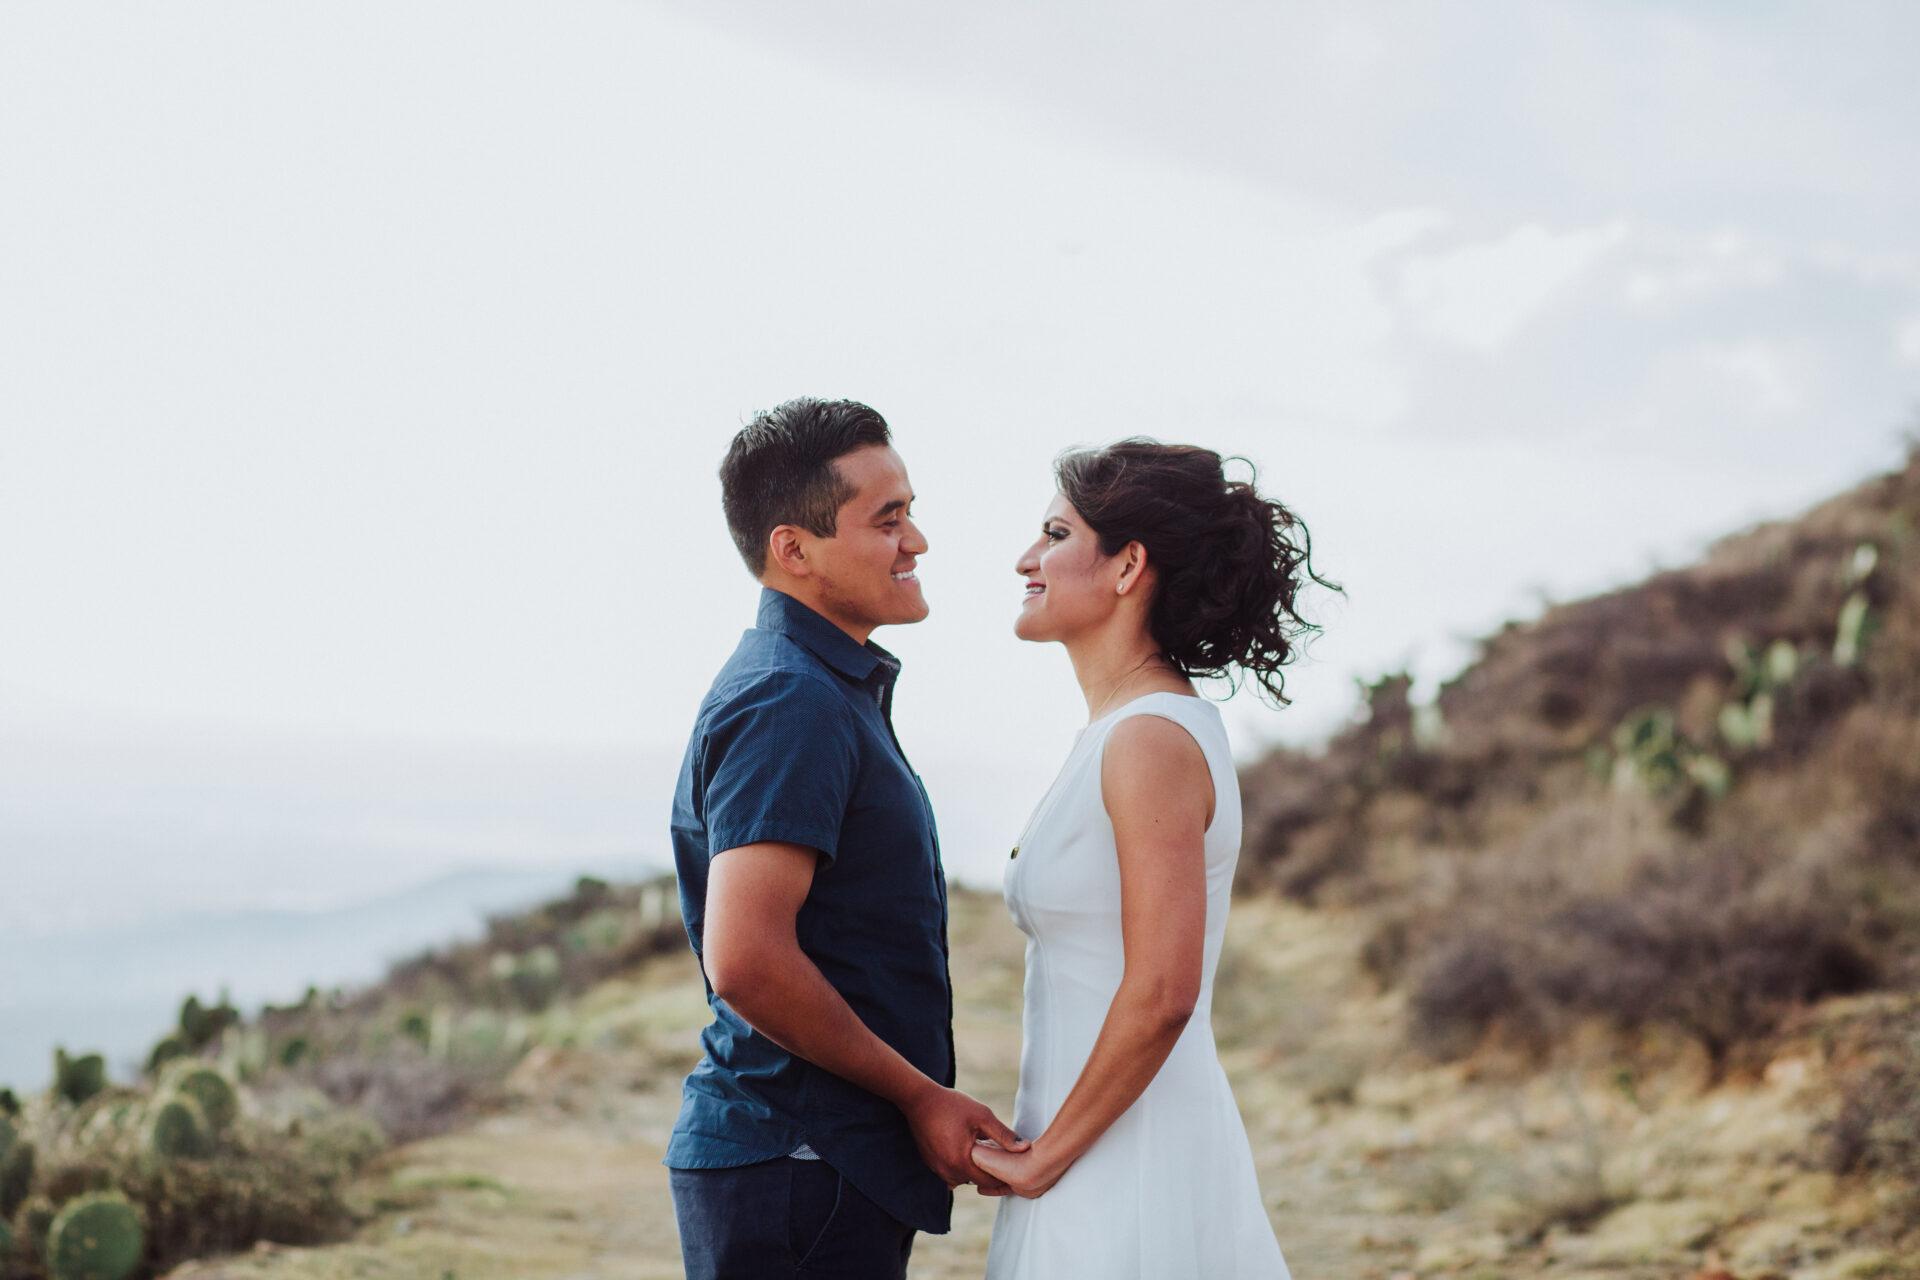 javier_noriega_fotografo_save_the_date_zacatecas_wedding_photographer2